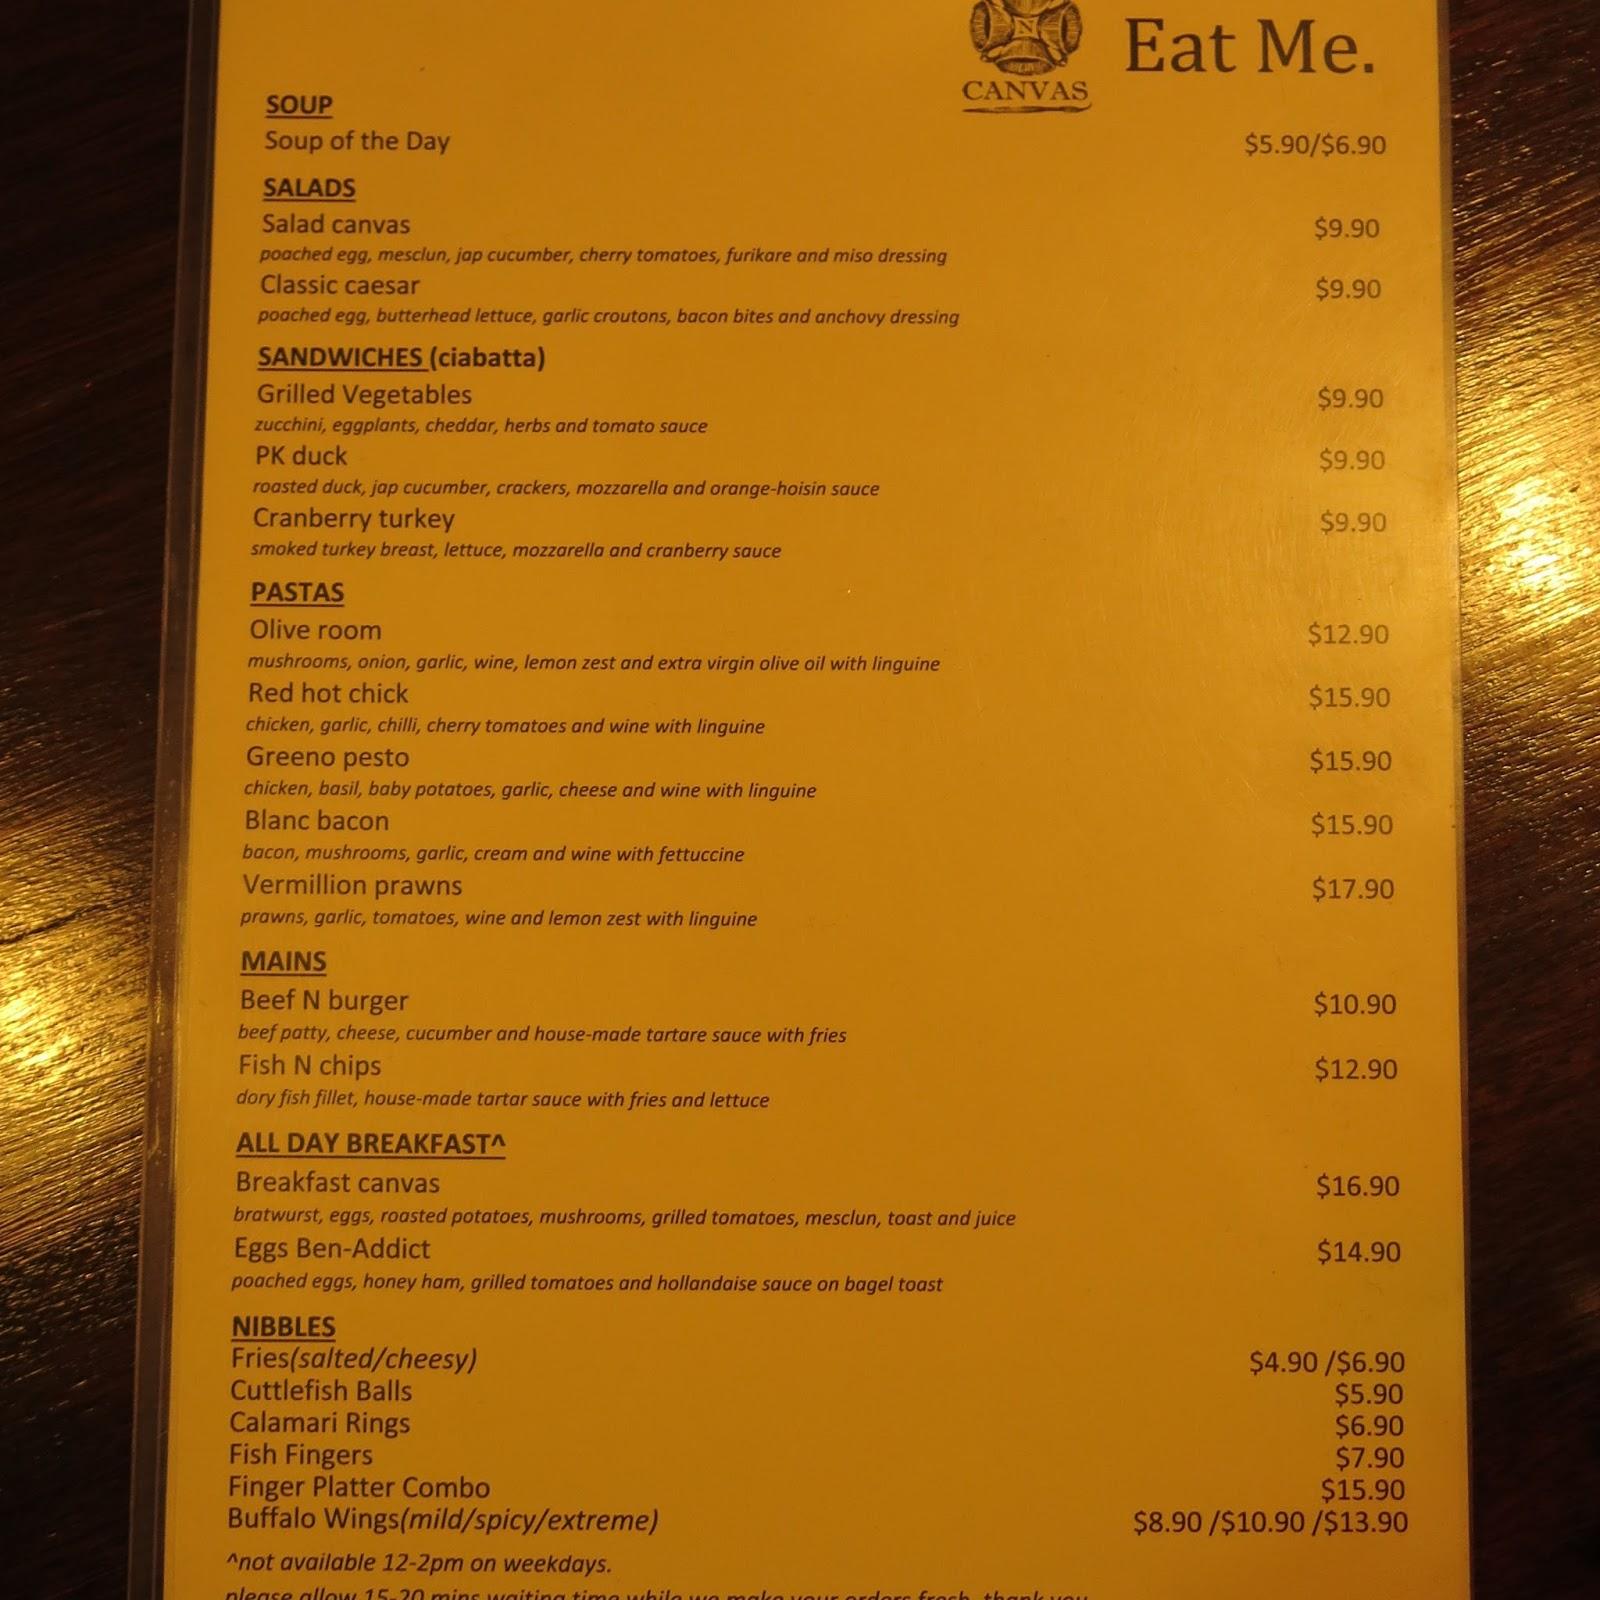 The cup singapore menu